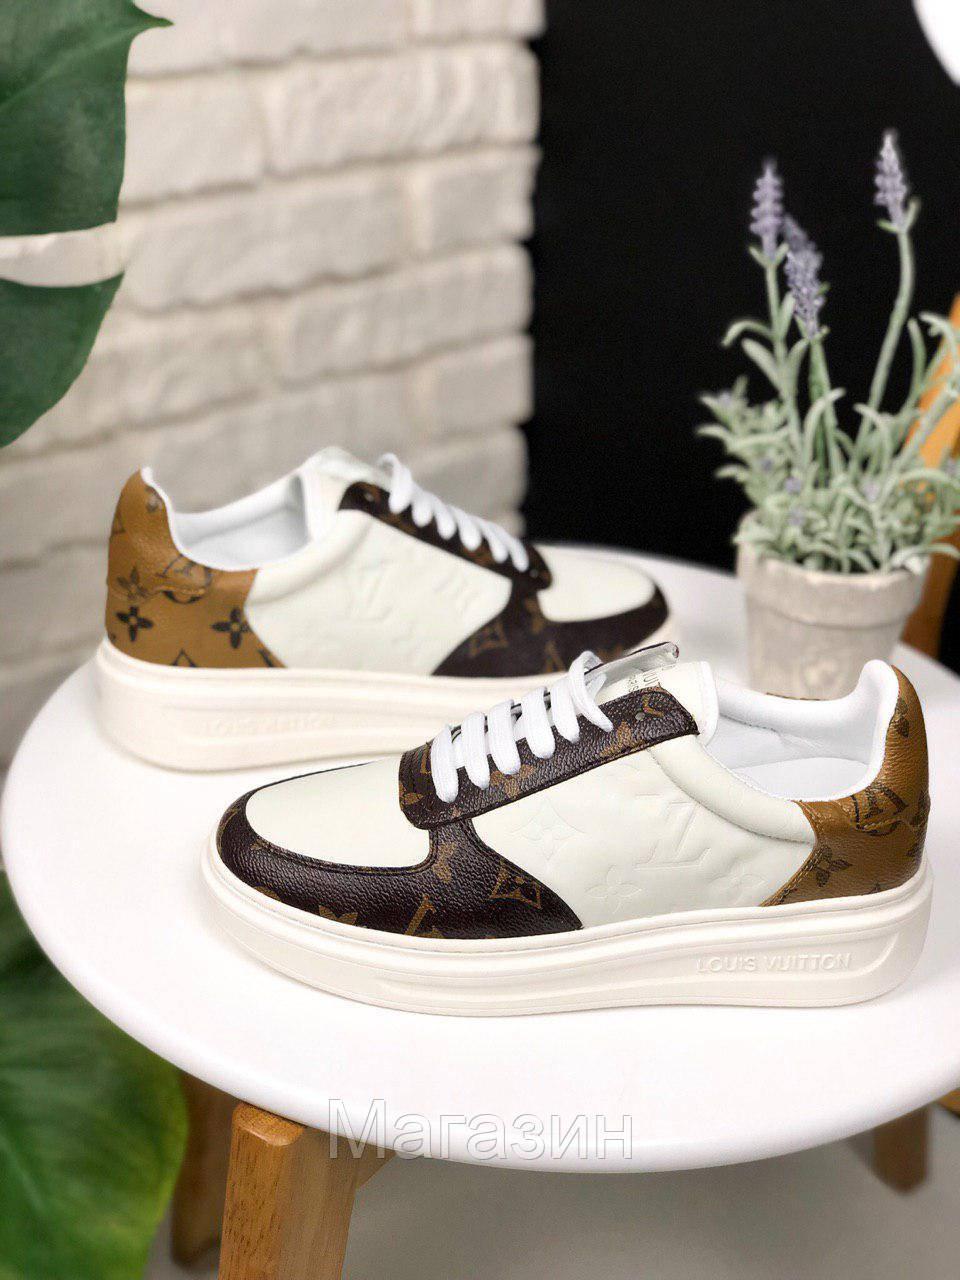 Женские кроссовки Louis Vuitton Sneakers Brown White (кеды Луи Витон) белые